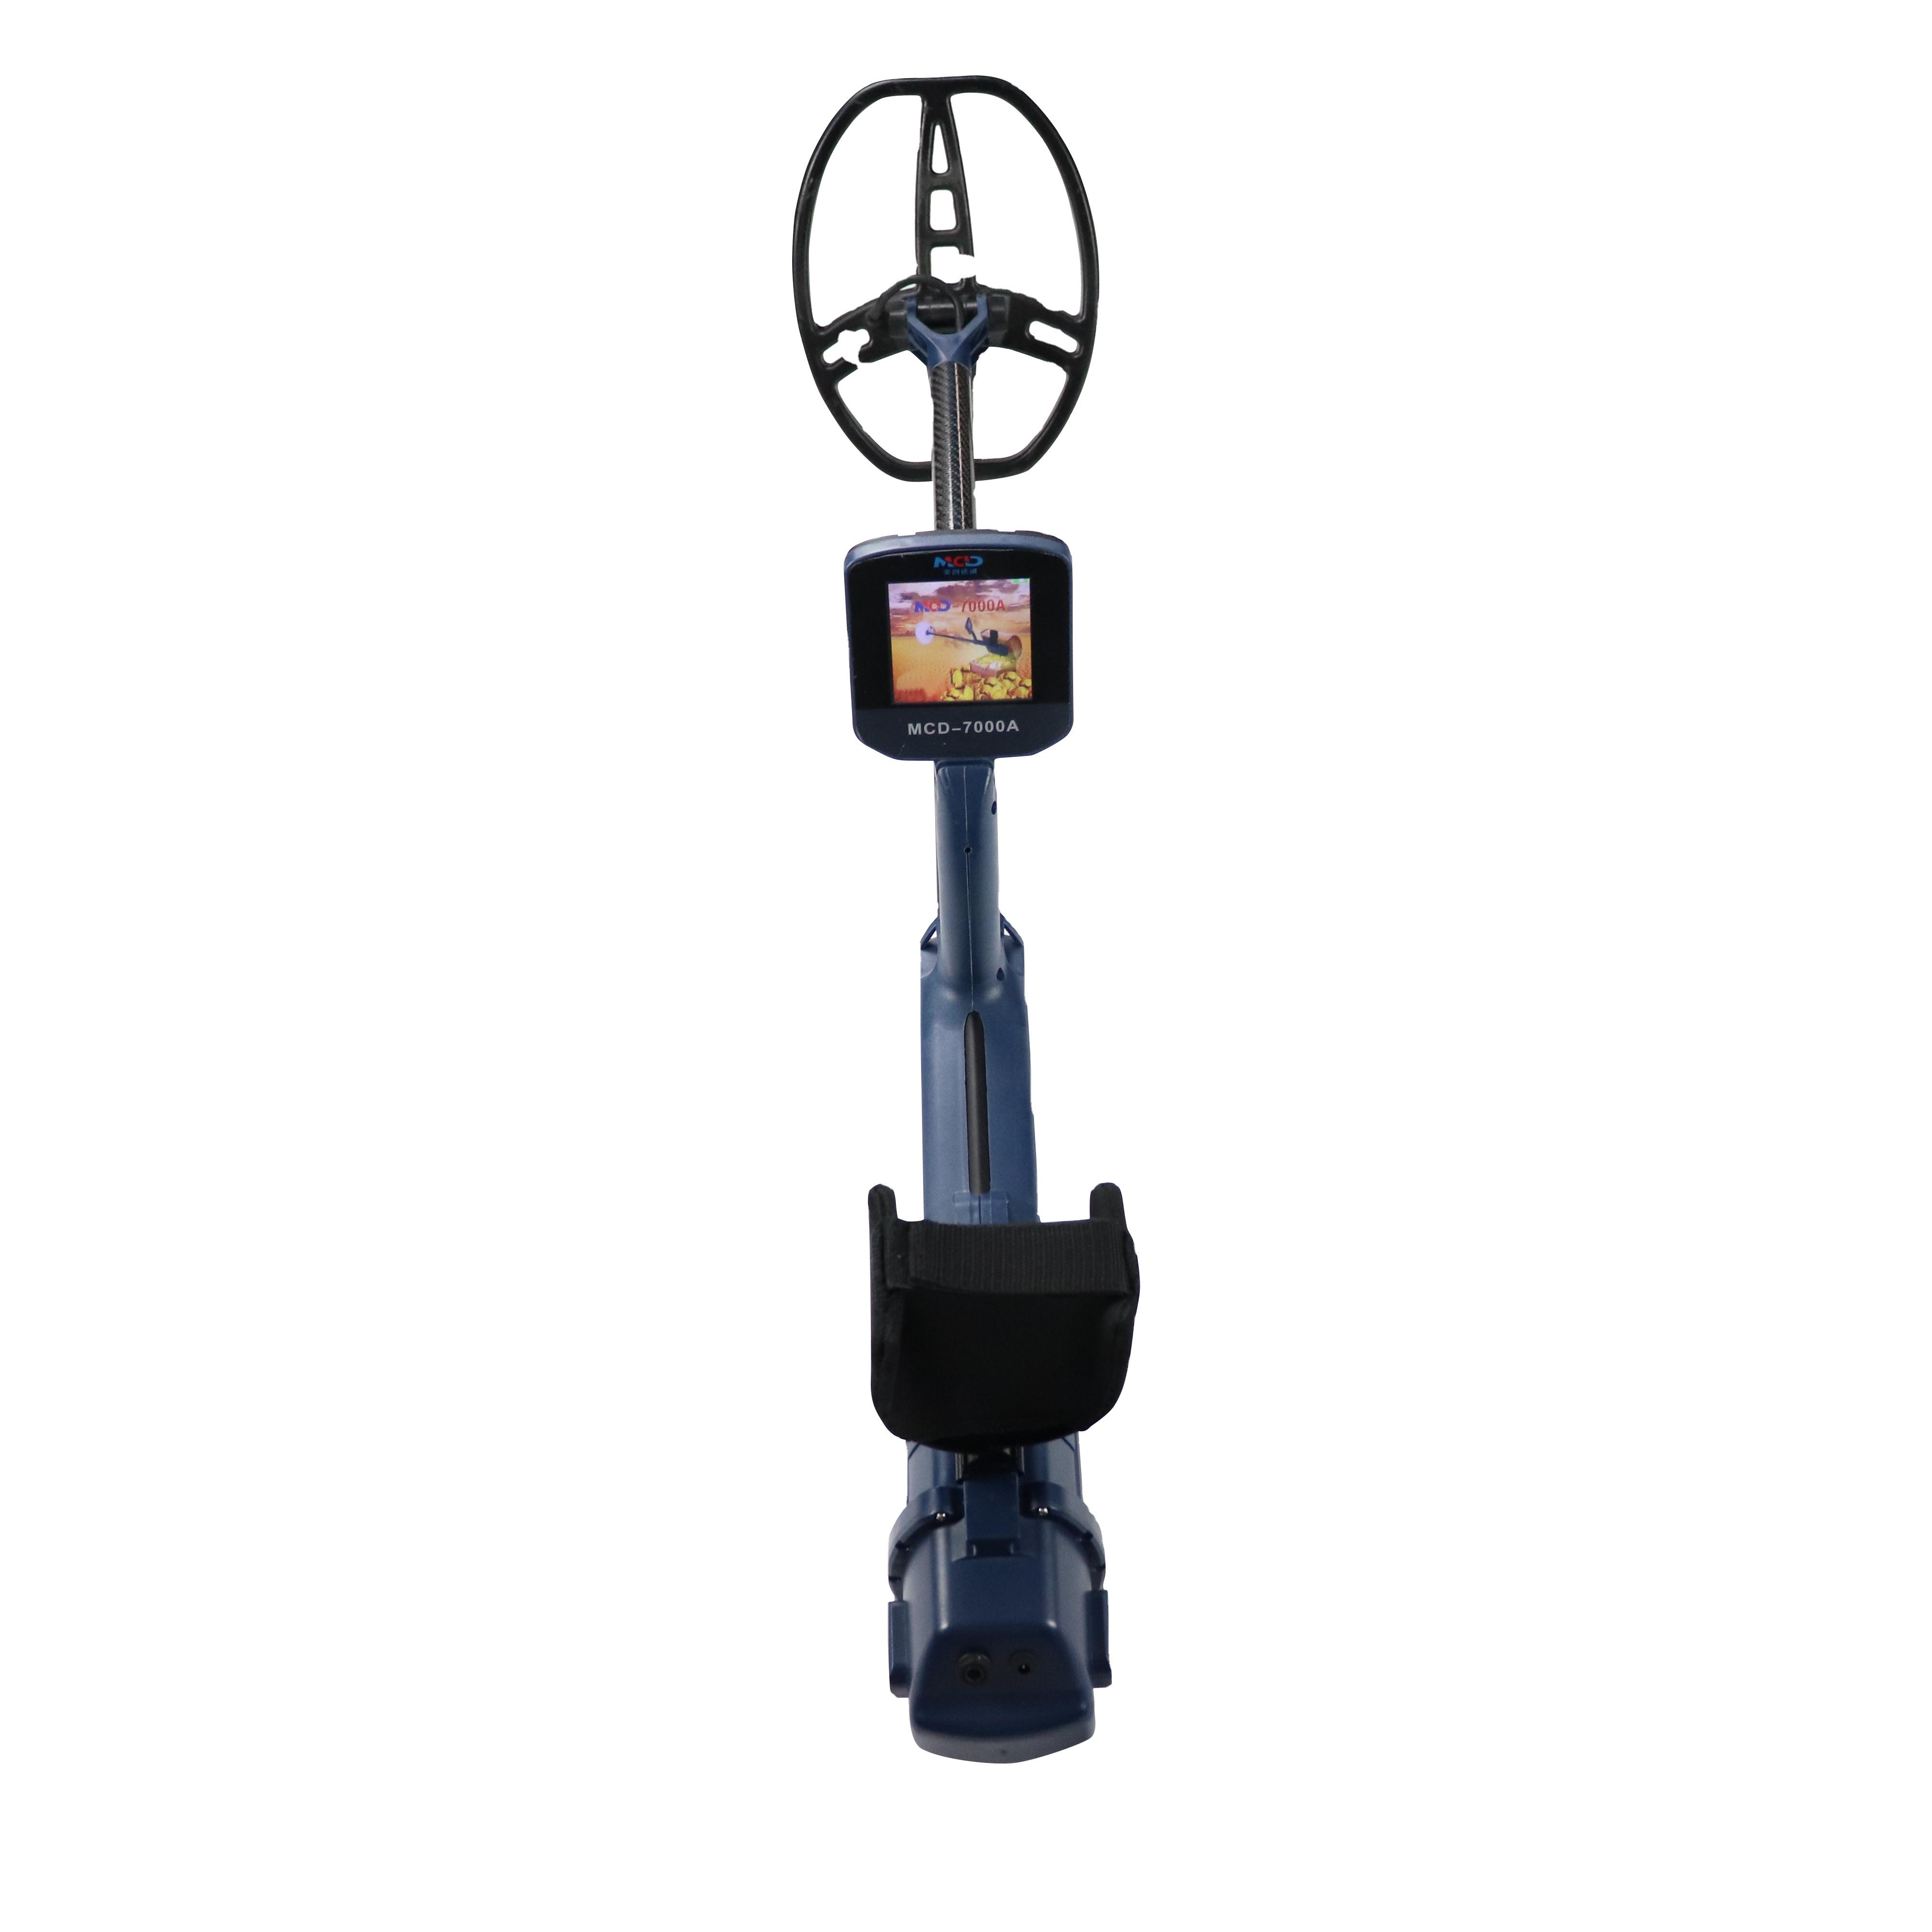 Touch screen high sensitivity under ground metal detector MCD-7000A